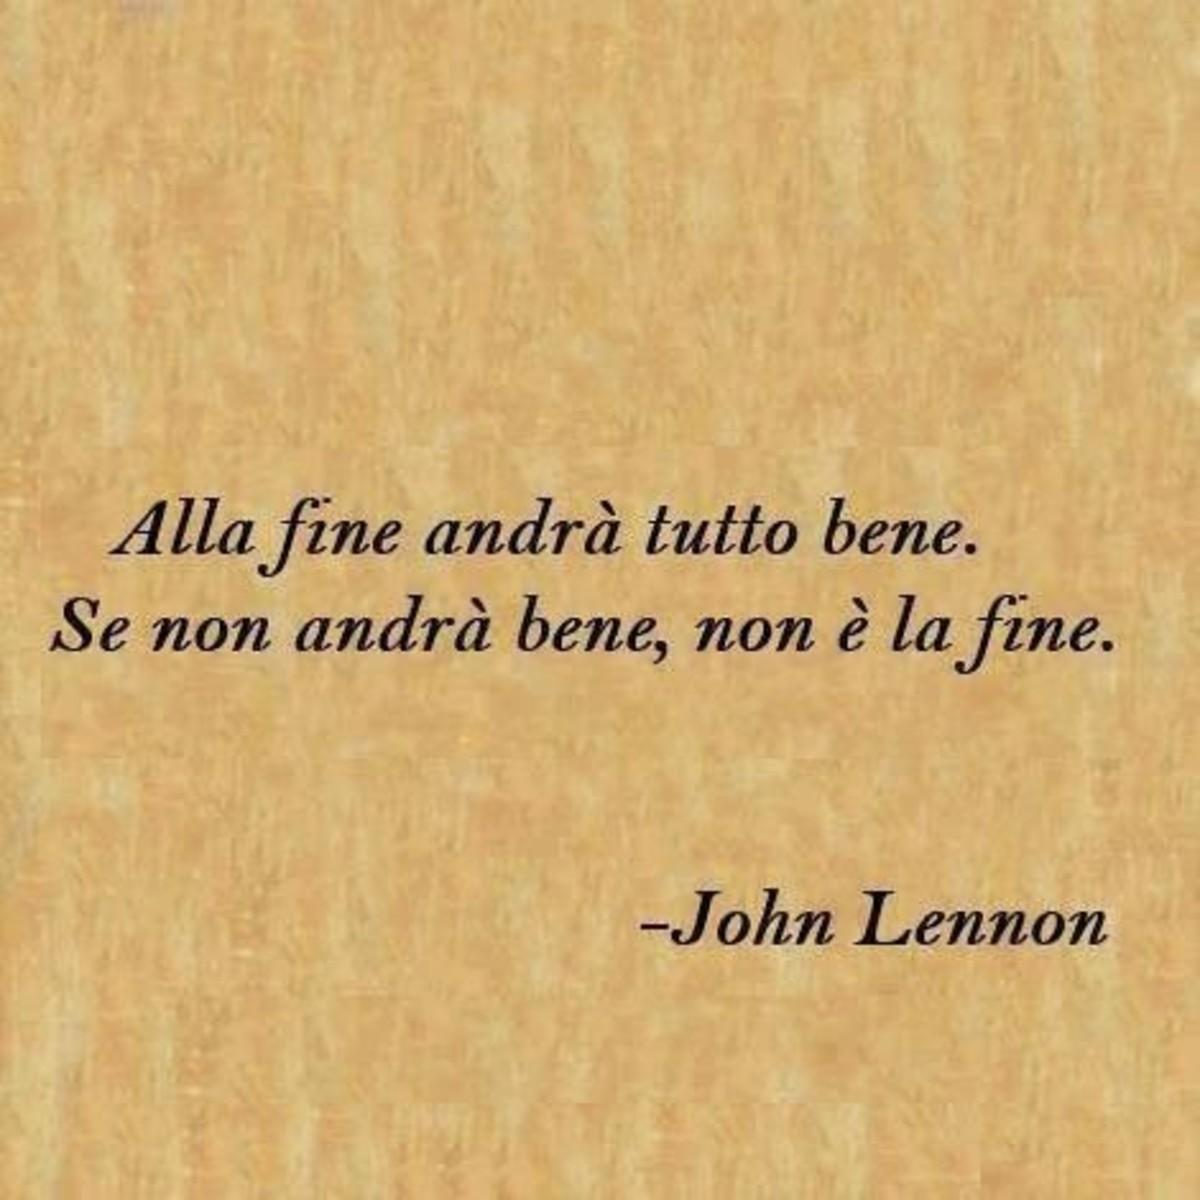 Frasi Sulla Vita John Lennon.Belle Frasi Di John Lennon Buongiornoate It